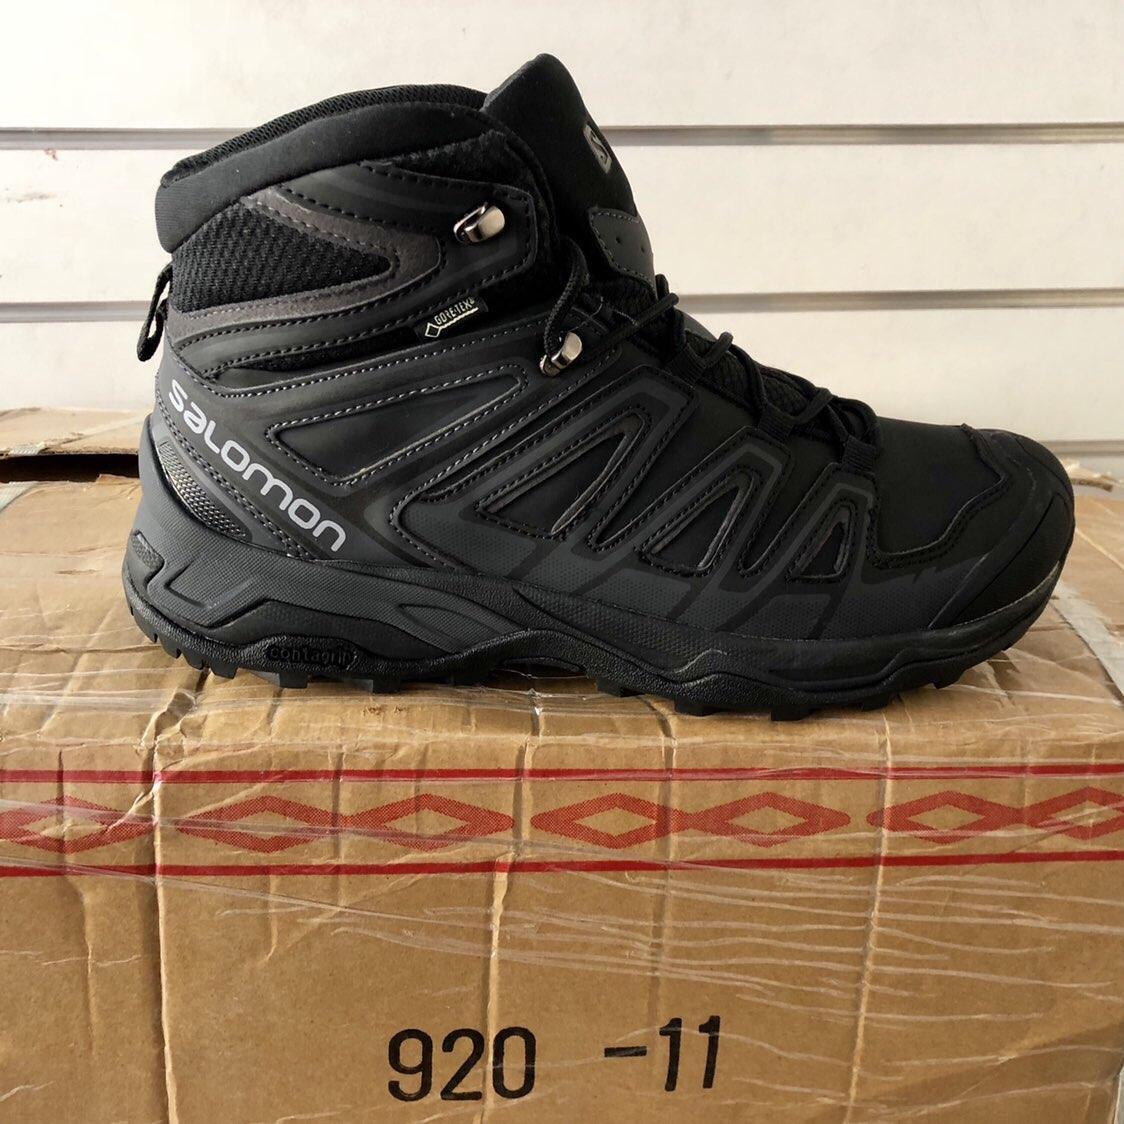 592b24e1 Мужские кроссовки Salomon оптом кроссовки саломон salomon кроссовки ...